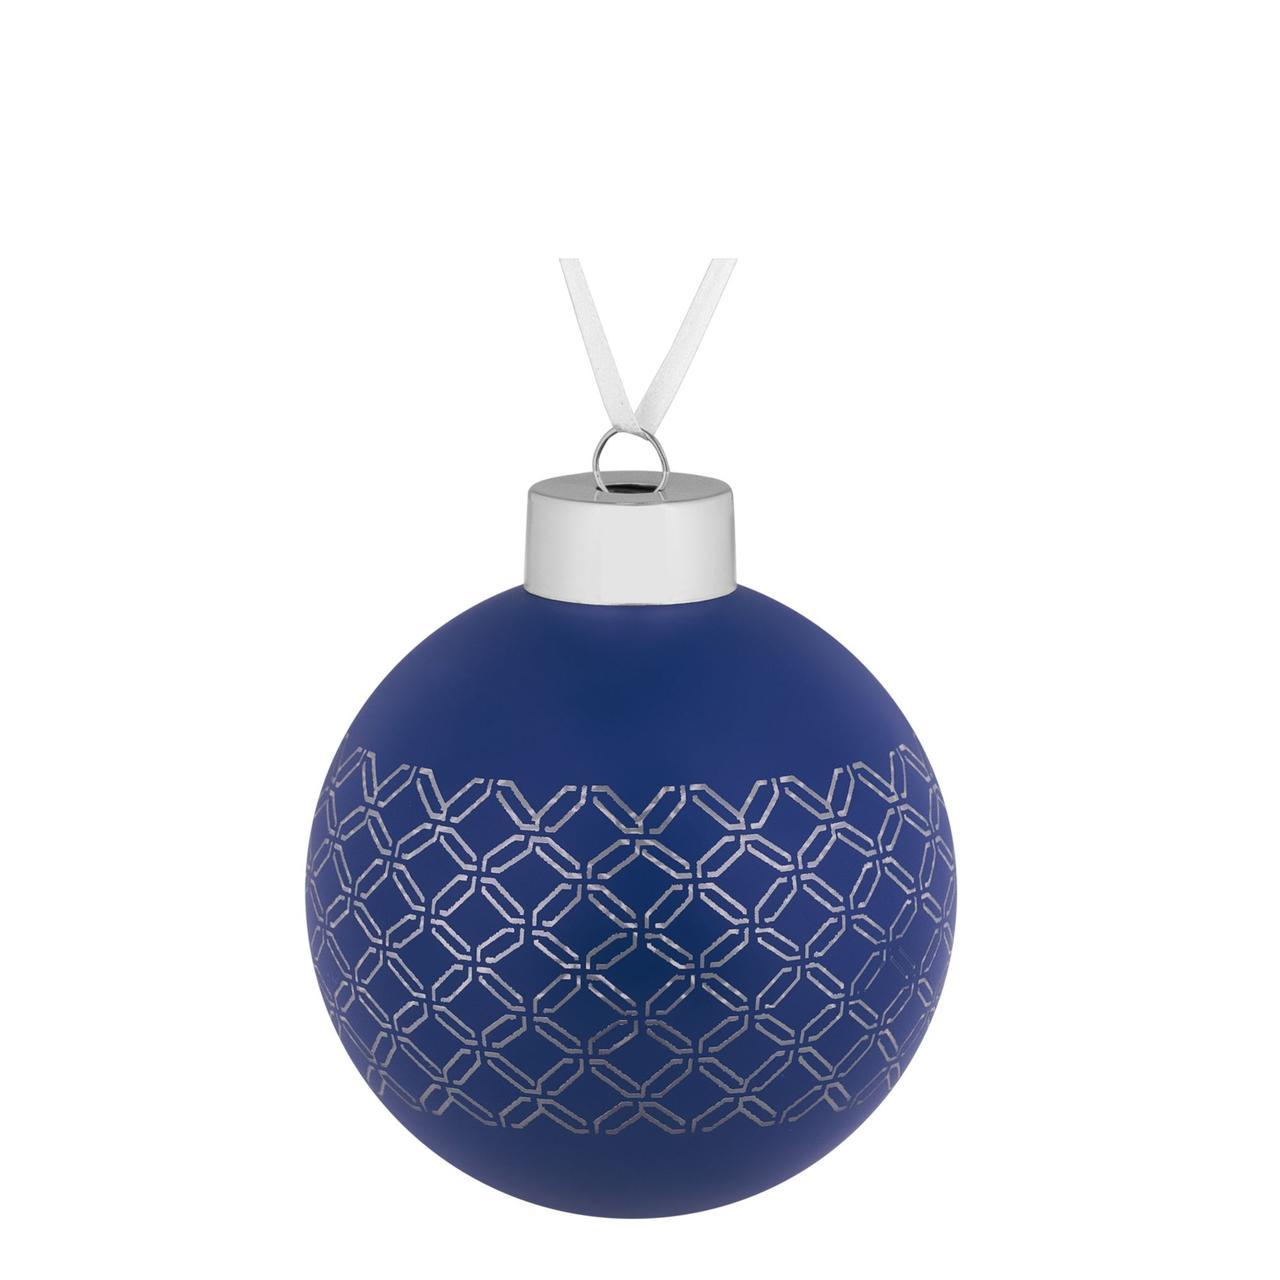 Елочный шар Queen, 8 см, синий (артикул 7171.40)